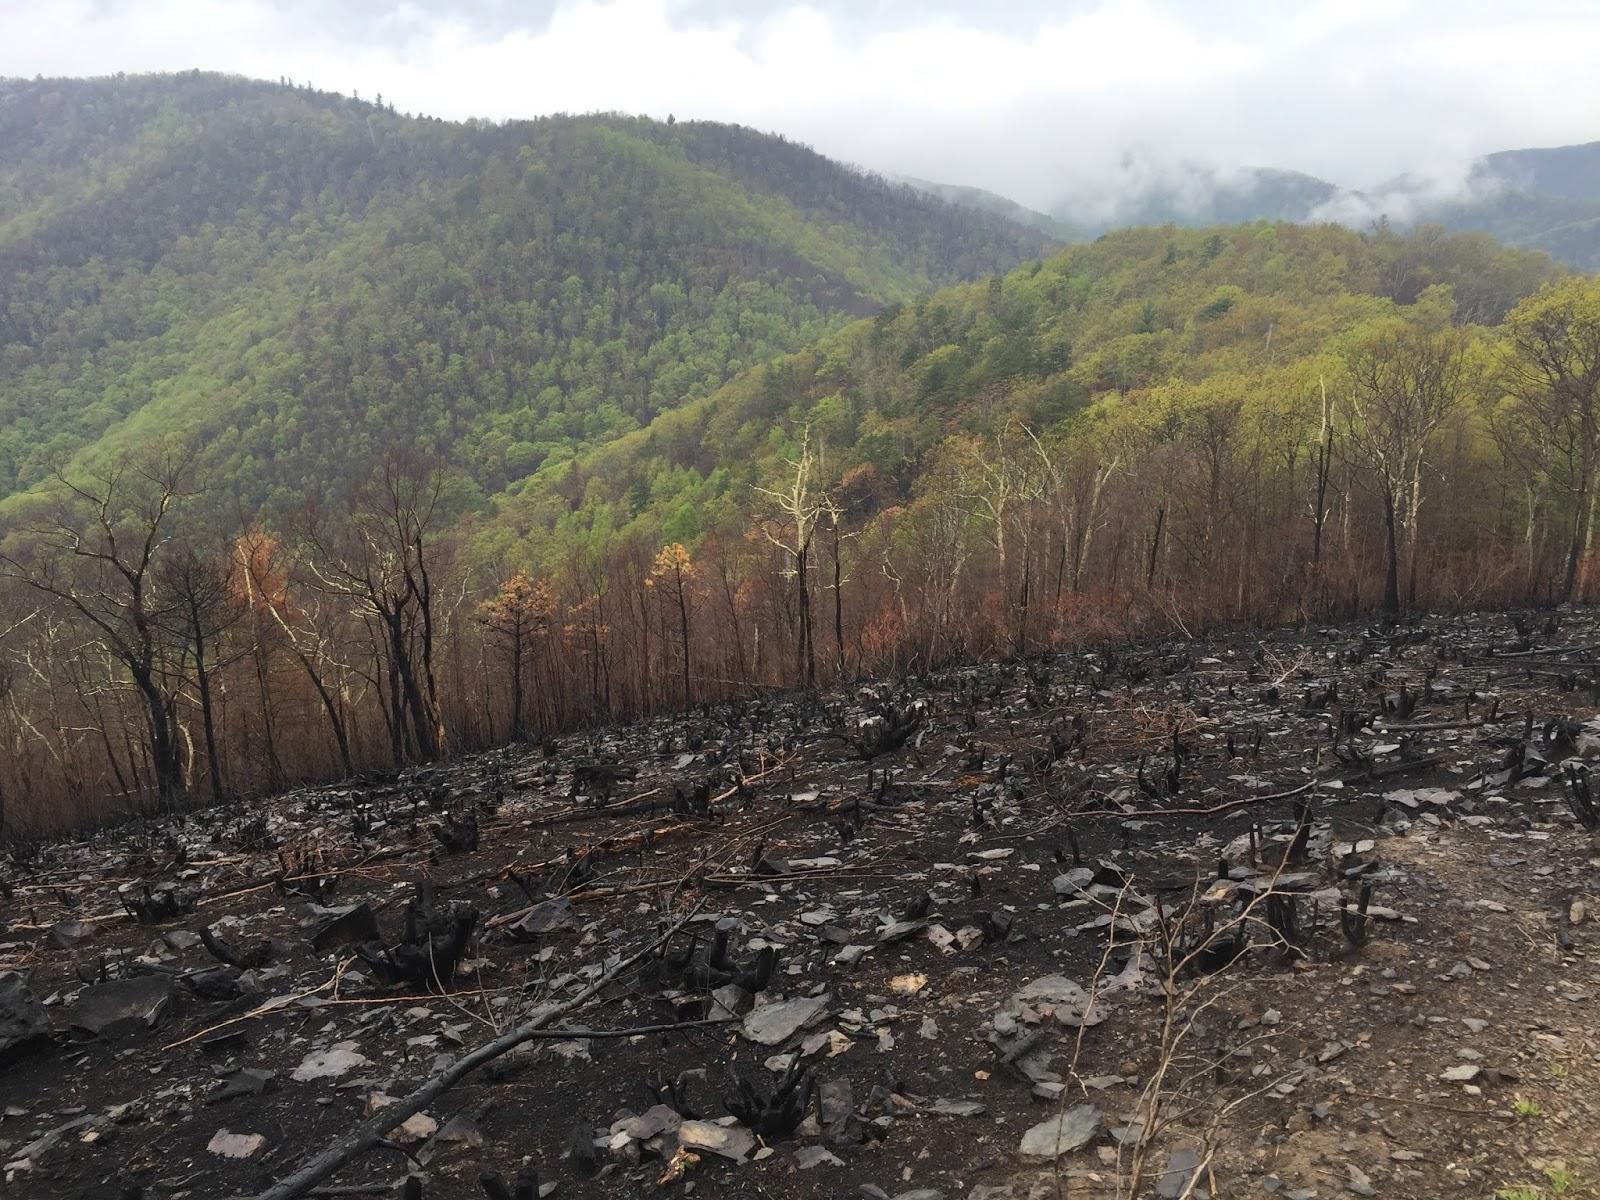 Wandering Virginia: SNP's Brown Mountain/Big Run Portal/Rocky Mtn